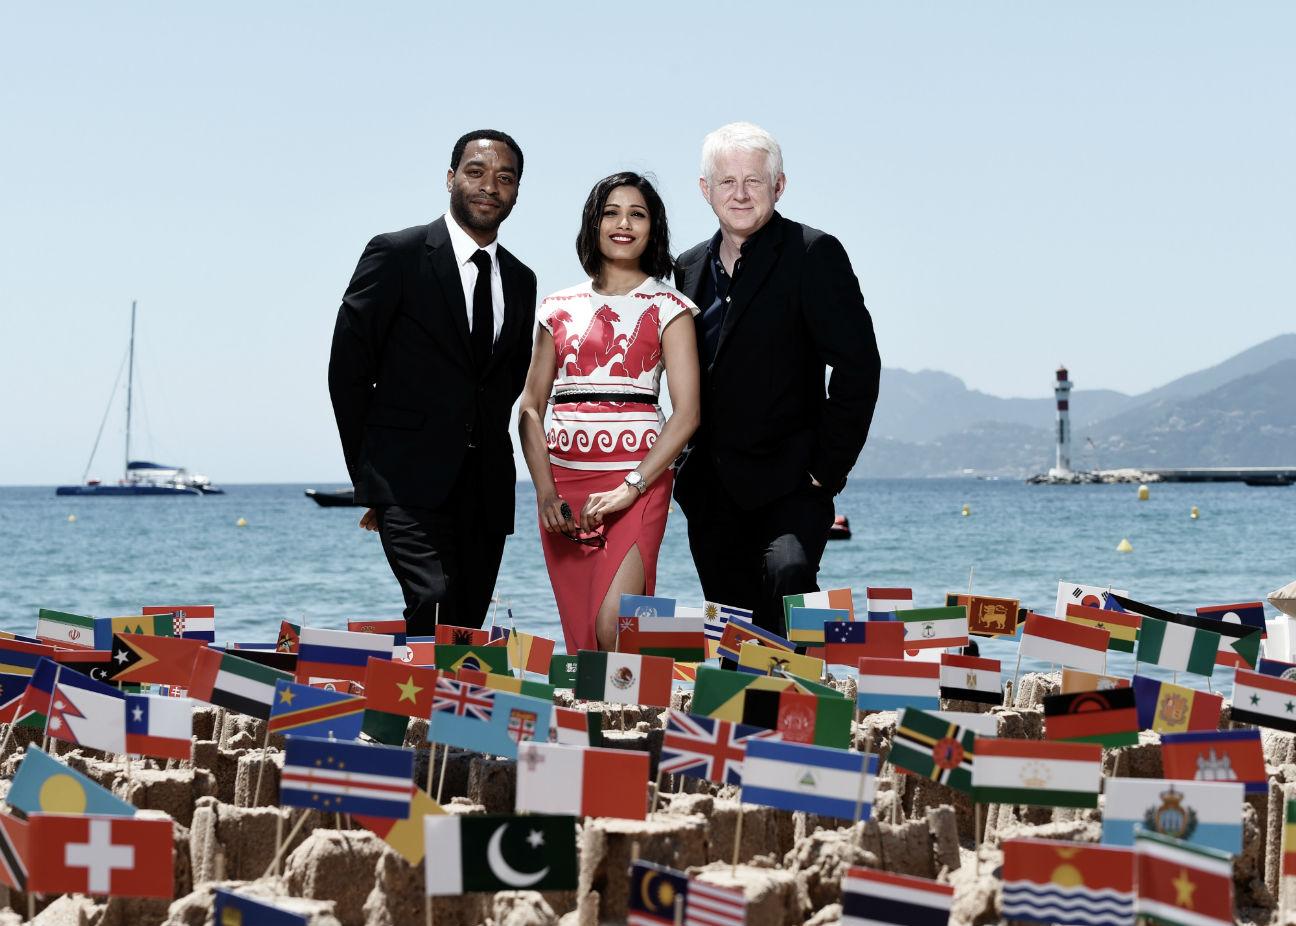 Global Goals Chiwetel Ejiofor, Freida Pinto and Richard Curtis